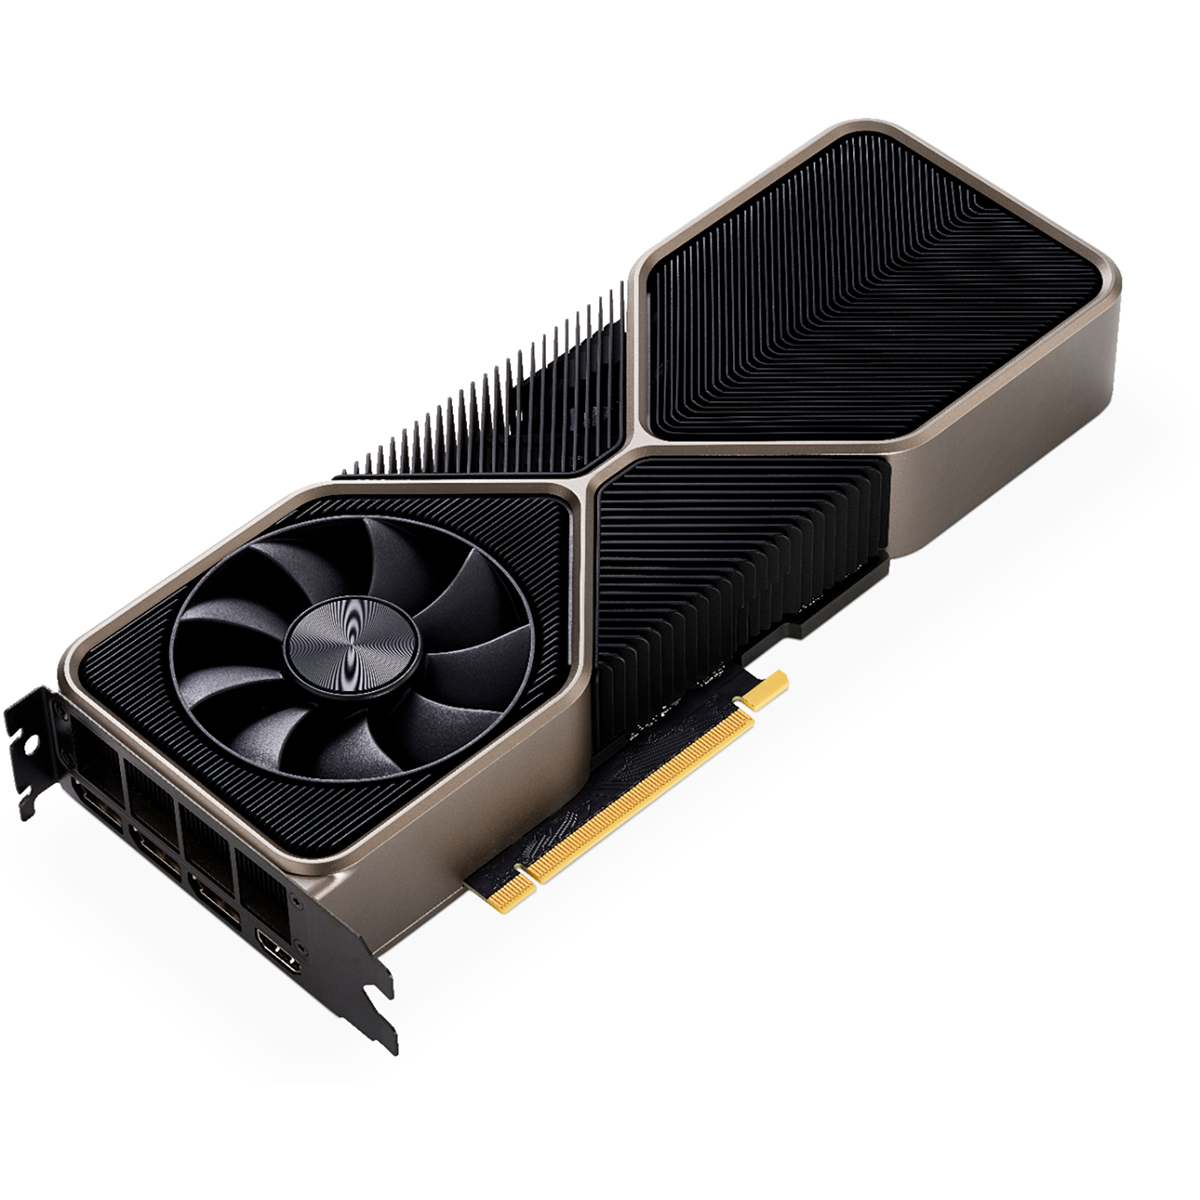 NVIDIA GeForce RTX 3080 10GB GDDR6X PCI Express 4.0 Graphics Card